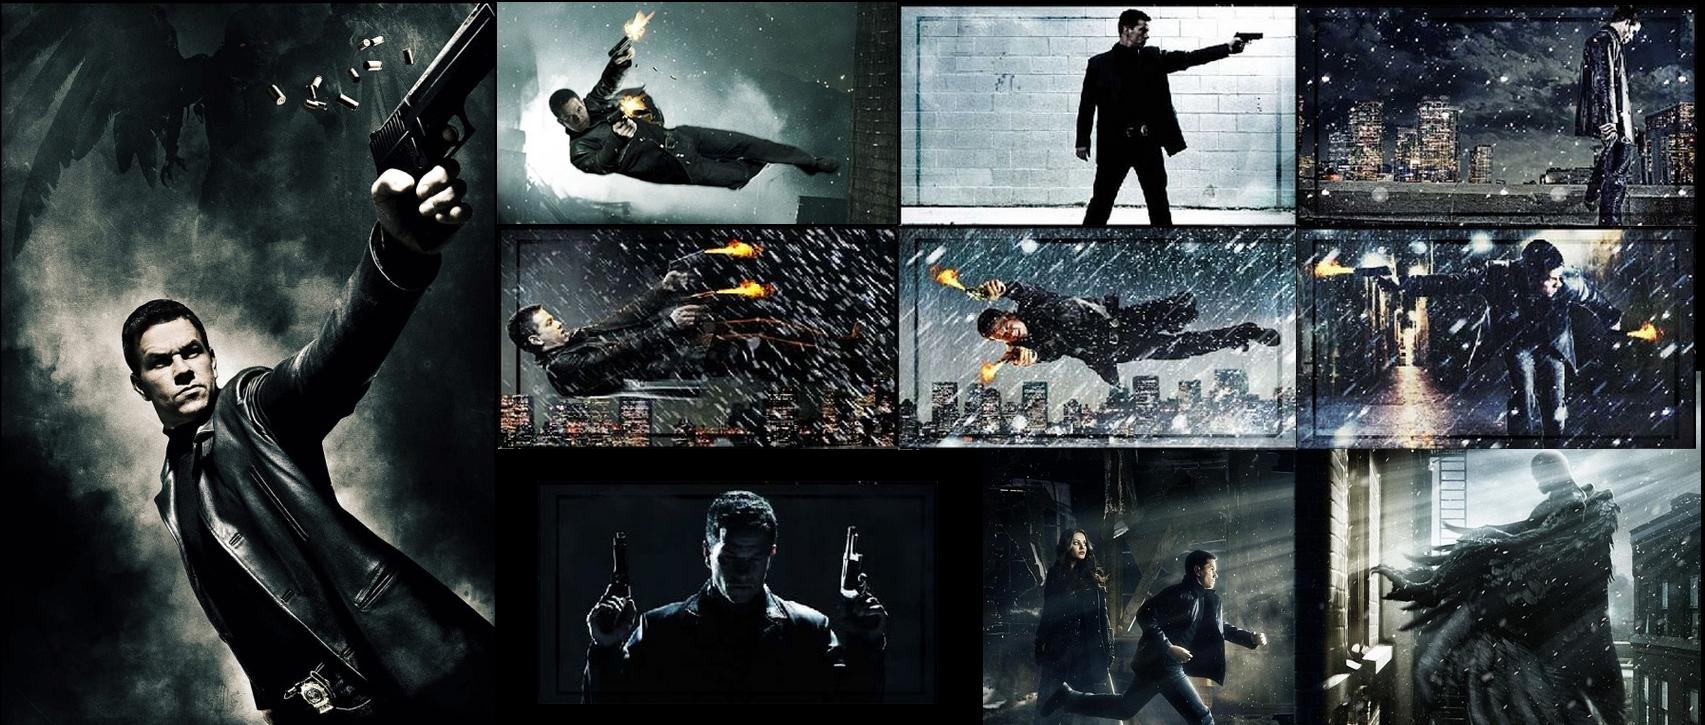 Popular Wallpaper Movie Max Payne - max-payne-wallpaper-3057  Snapshot_193264.jpg